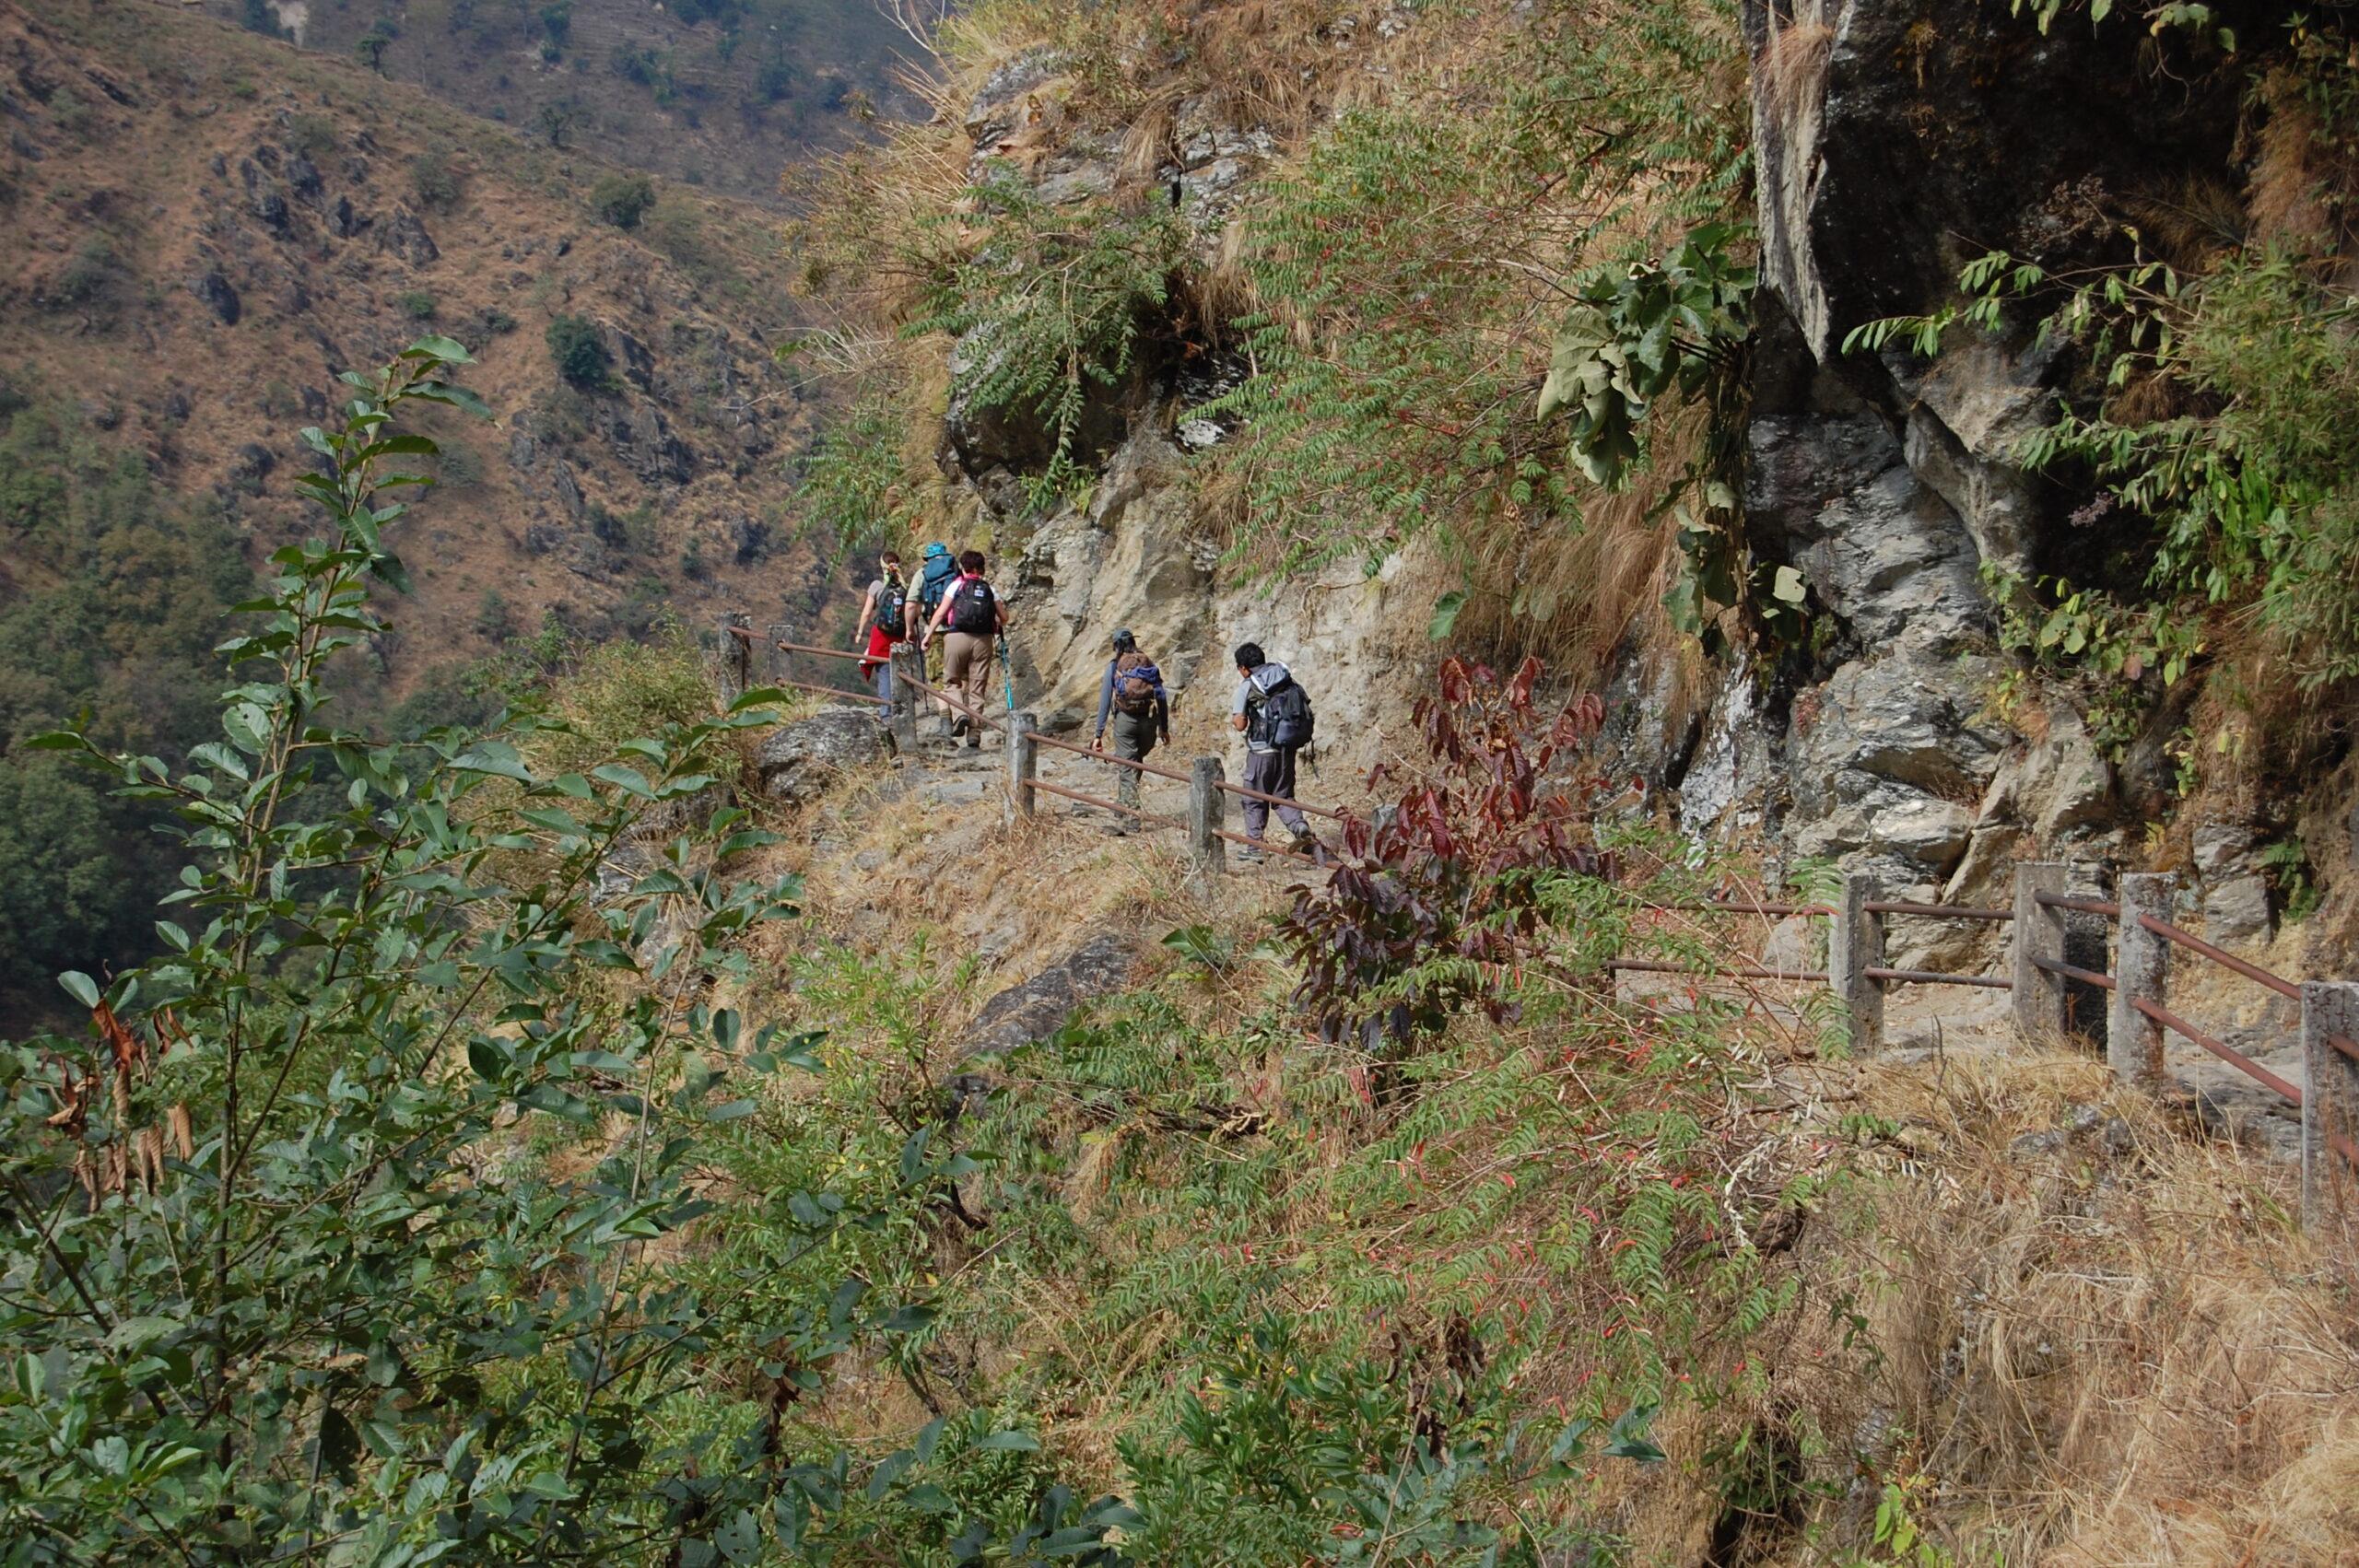 Trekkers on the Annapurna Circuit